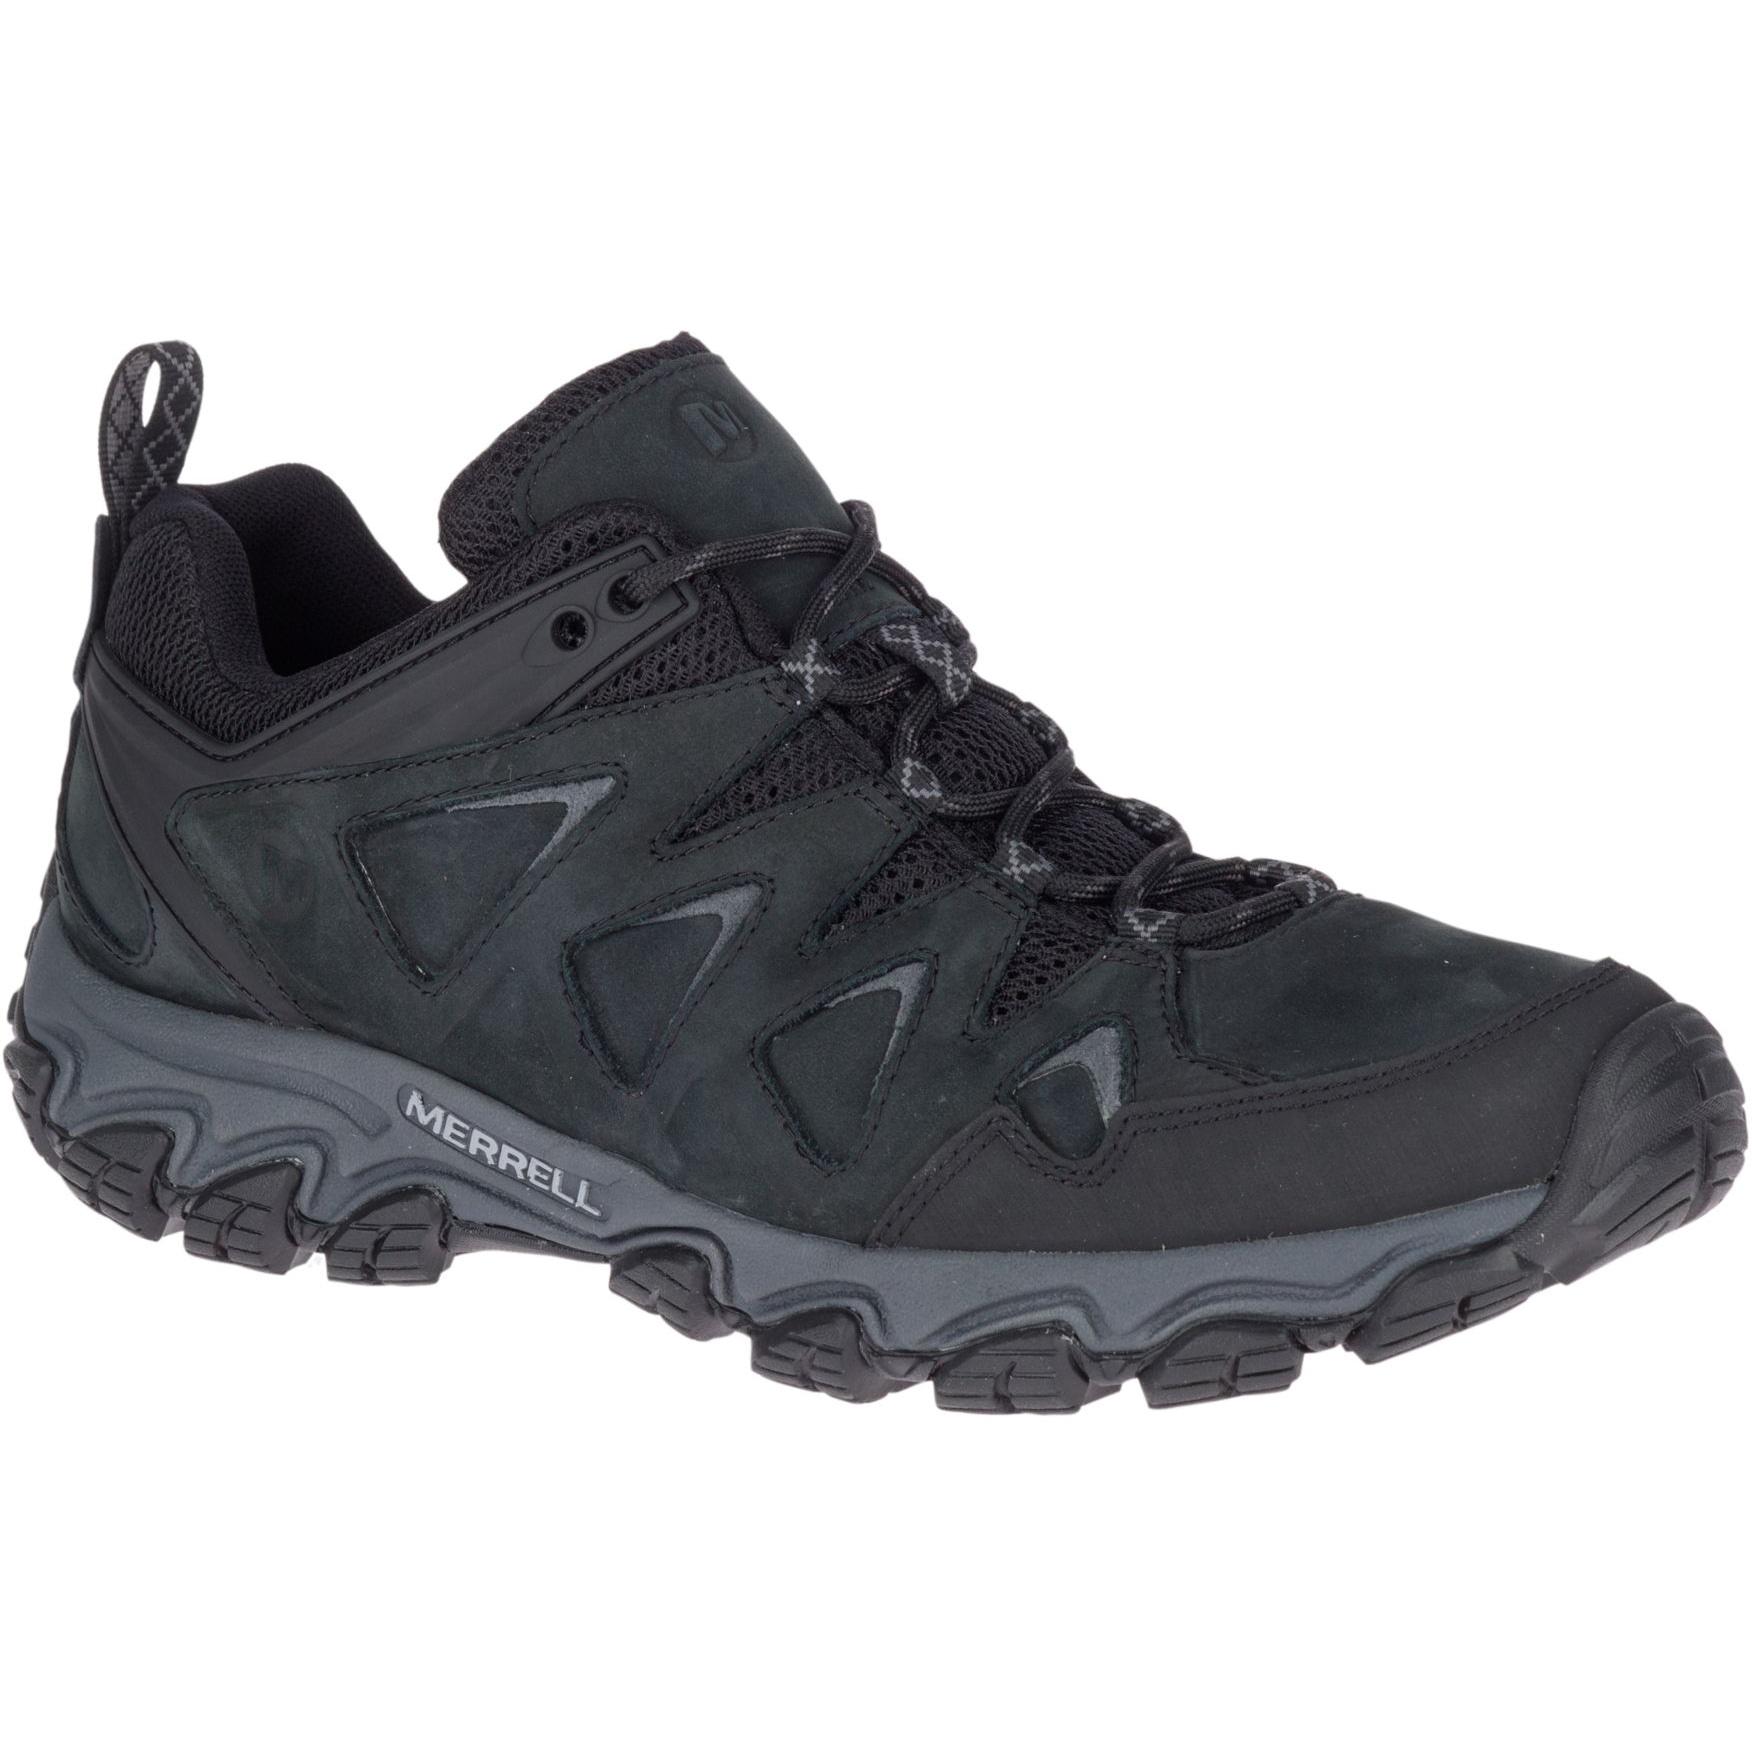 Pulsate 2 Leather Shoe - Men's